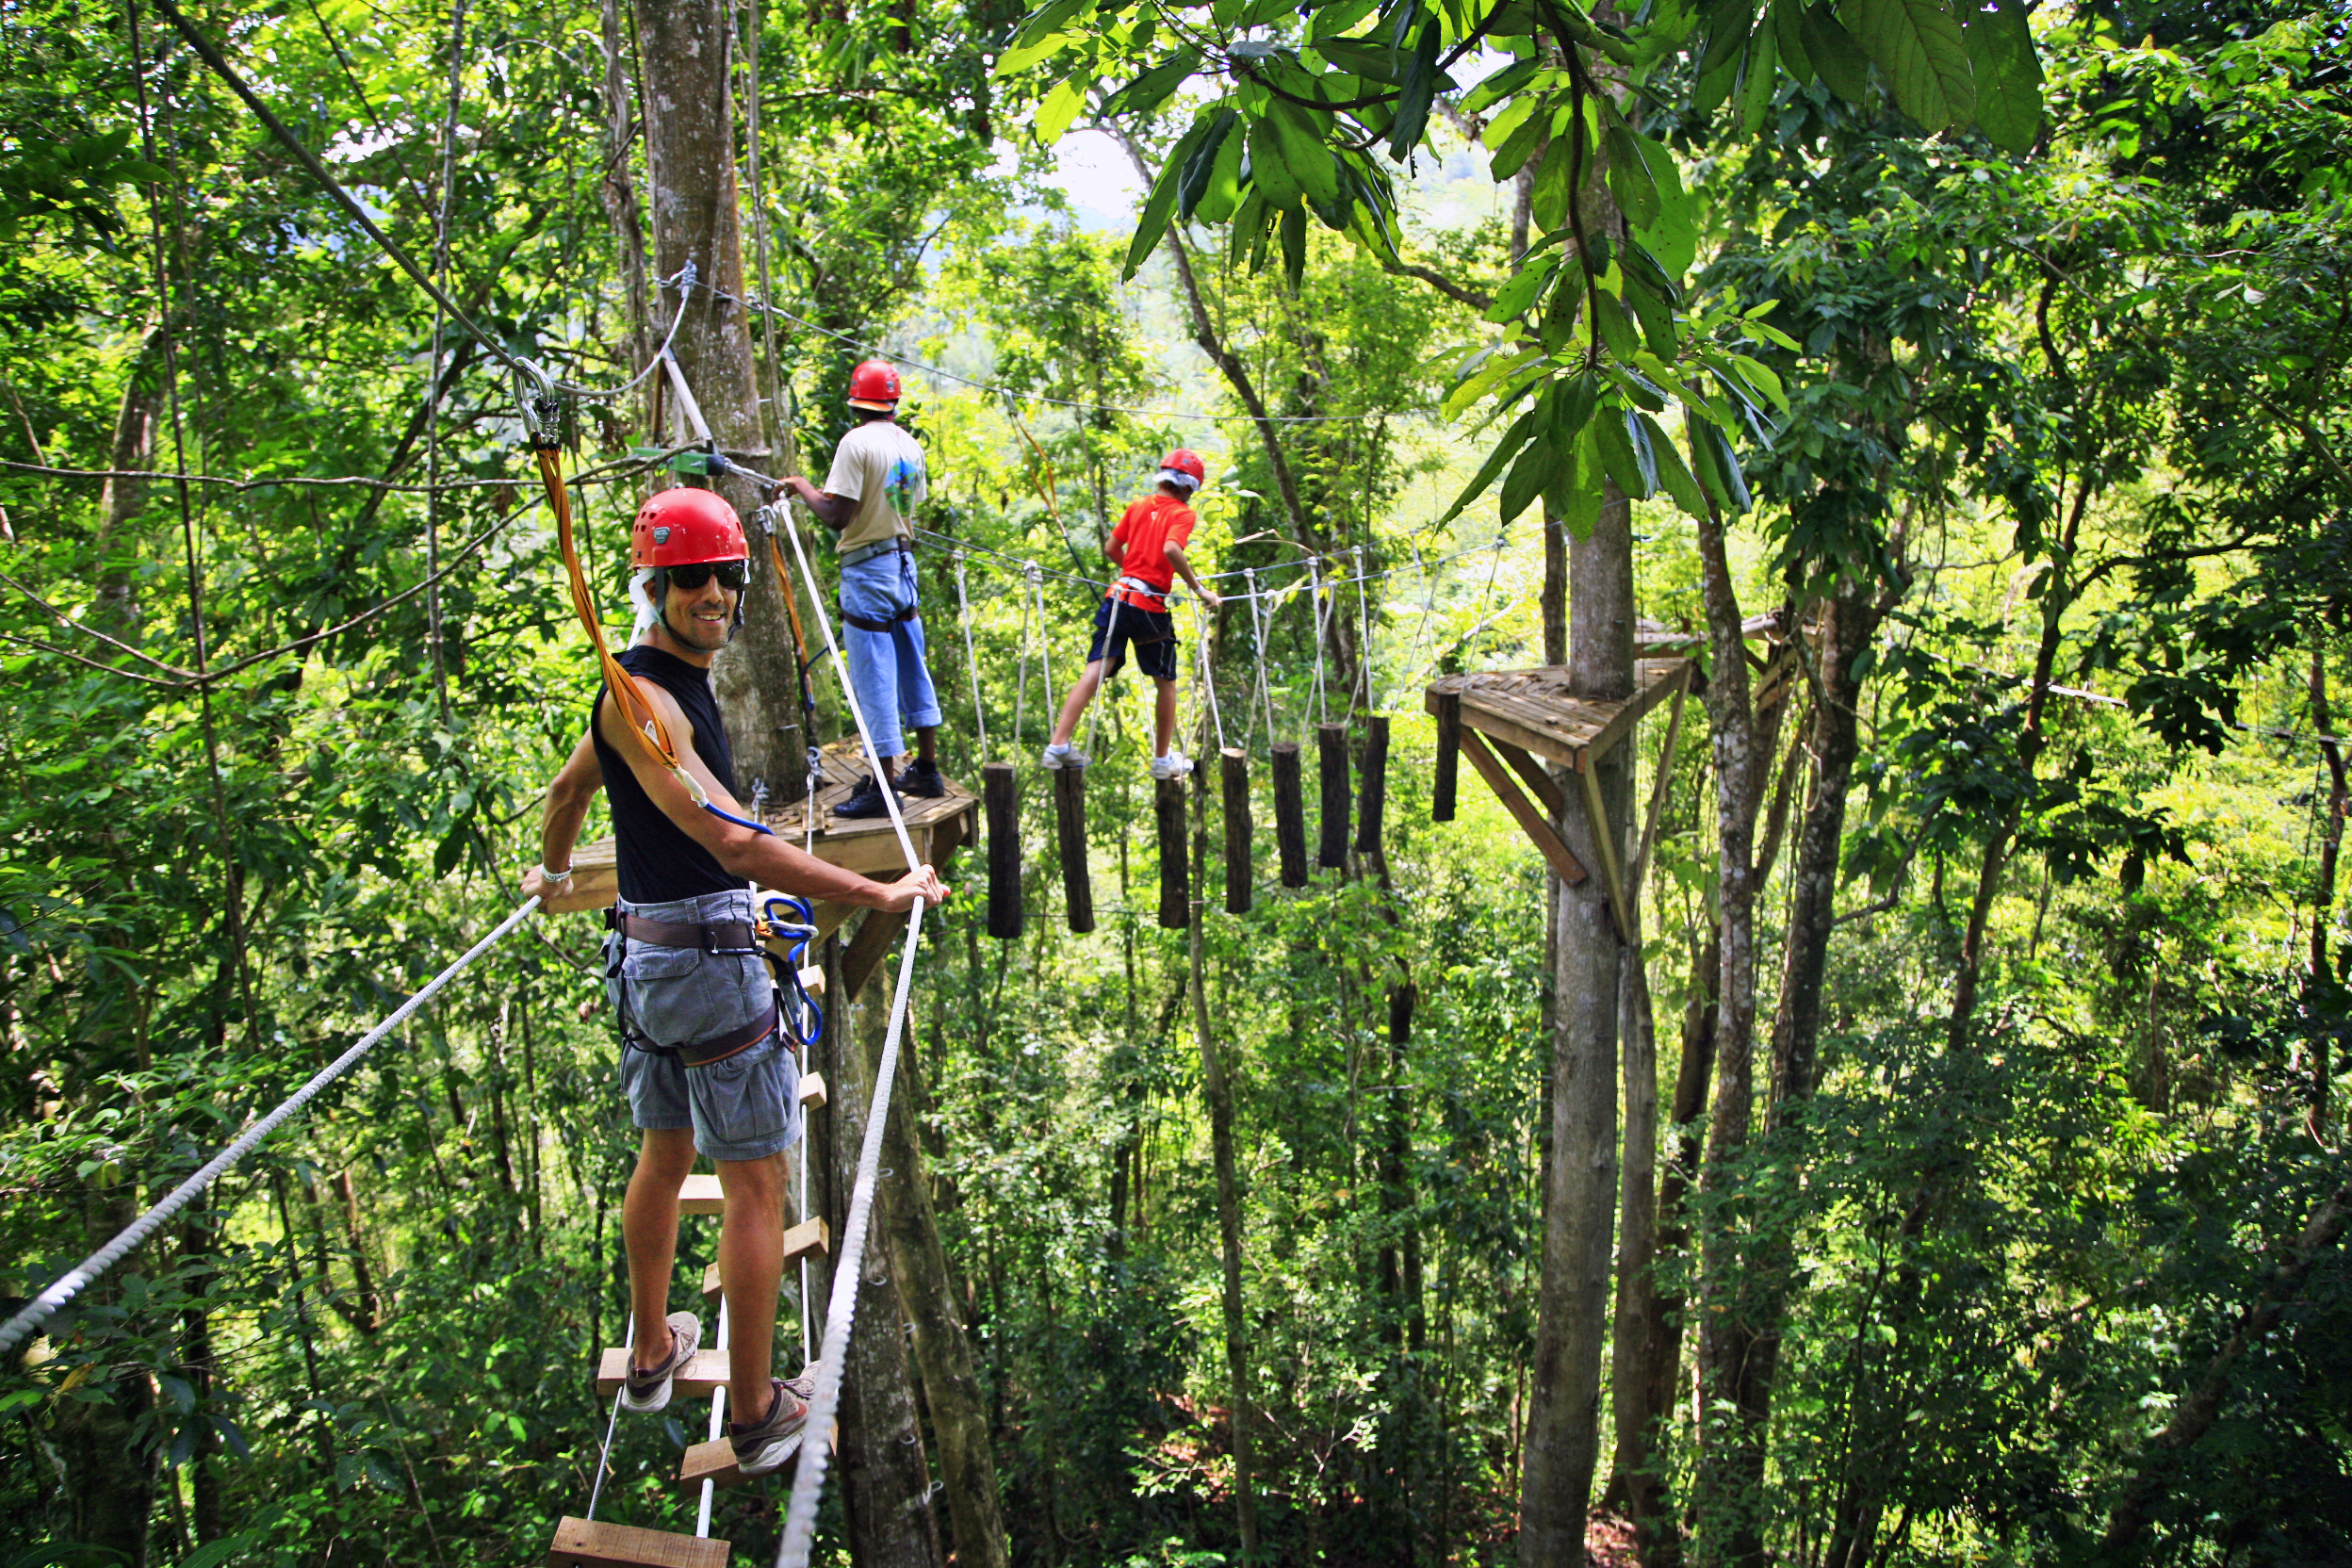 Rainforest canopy adventures